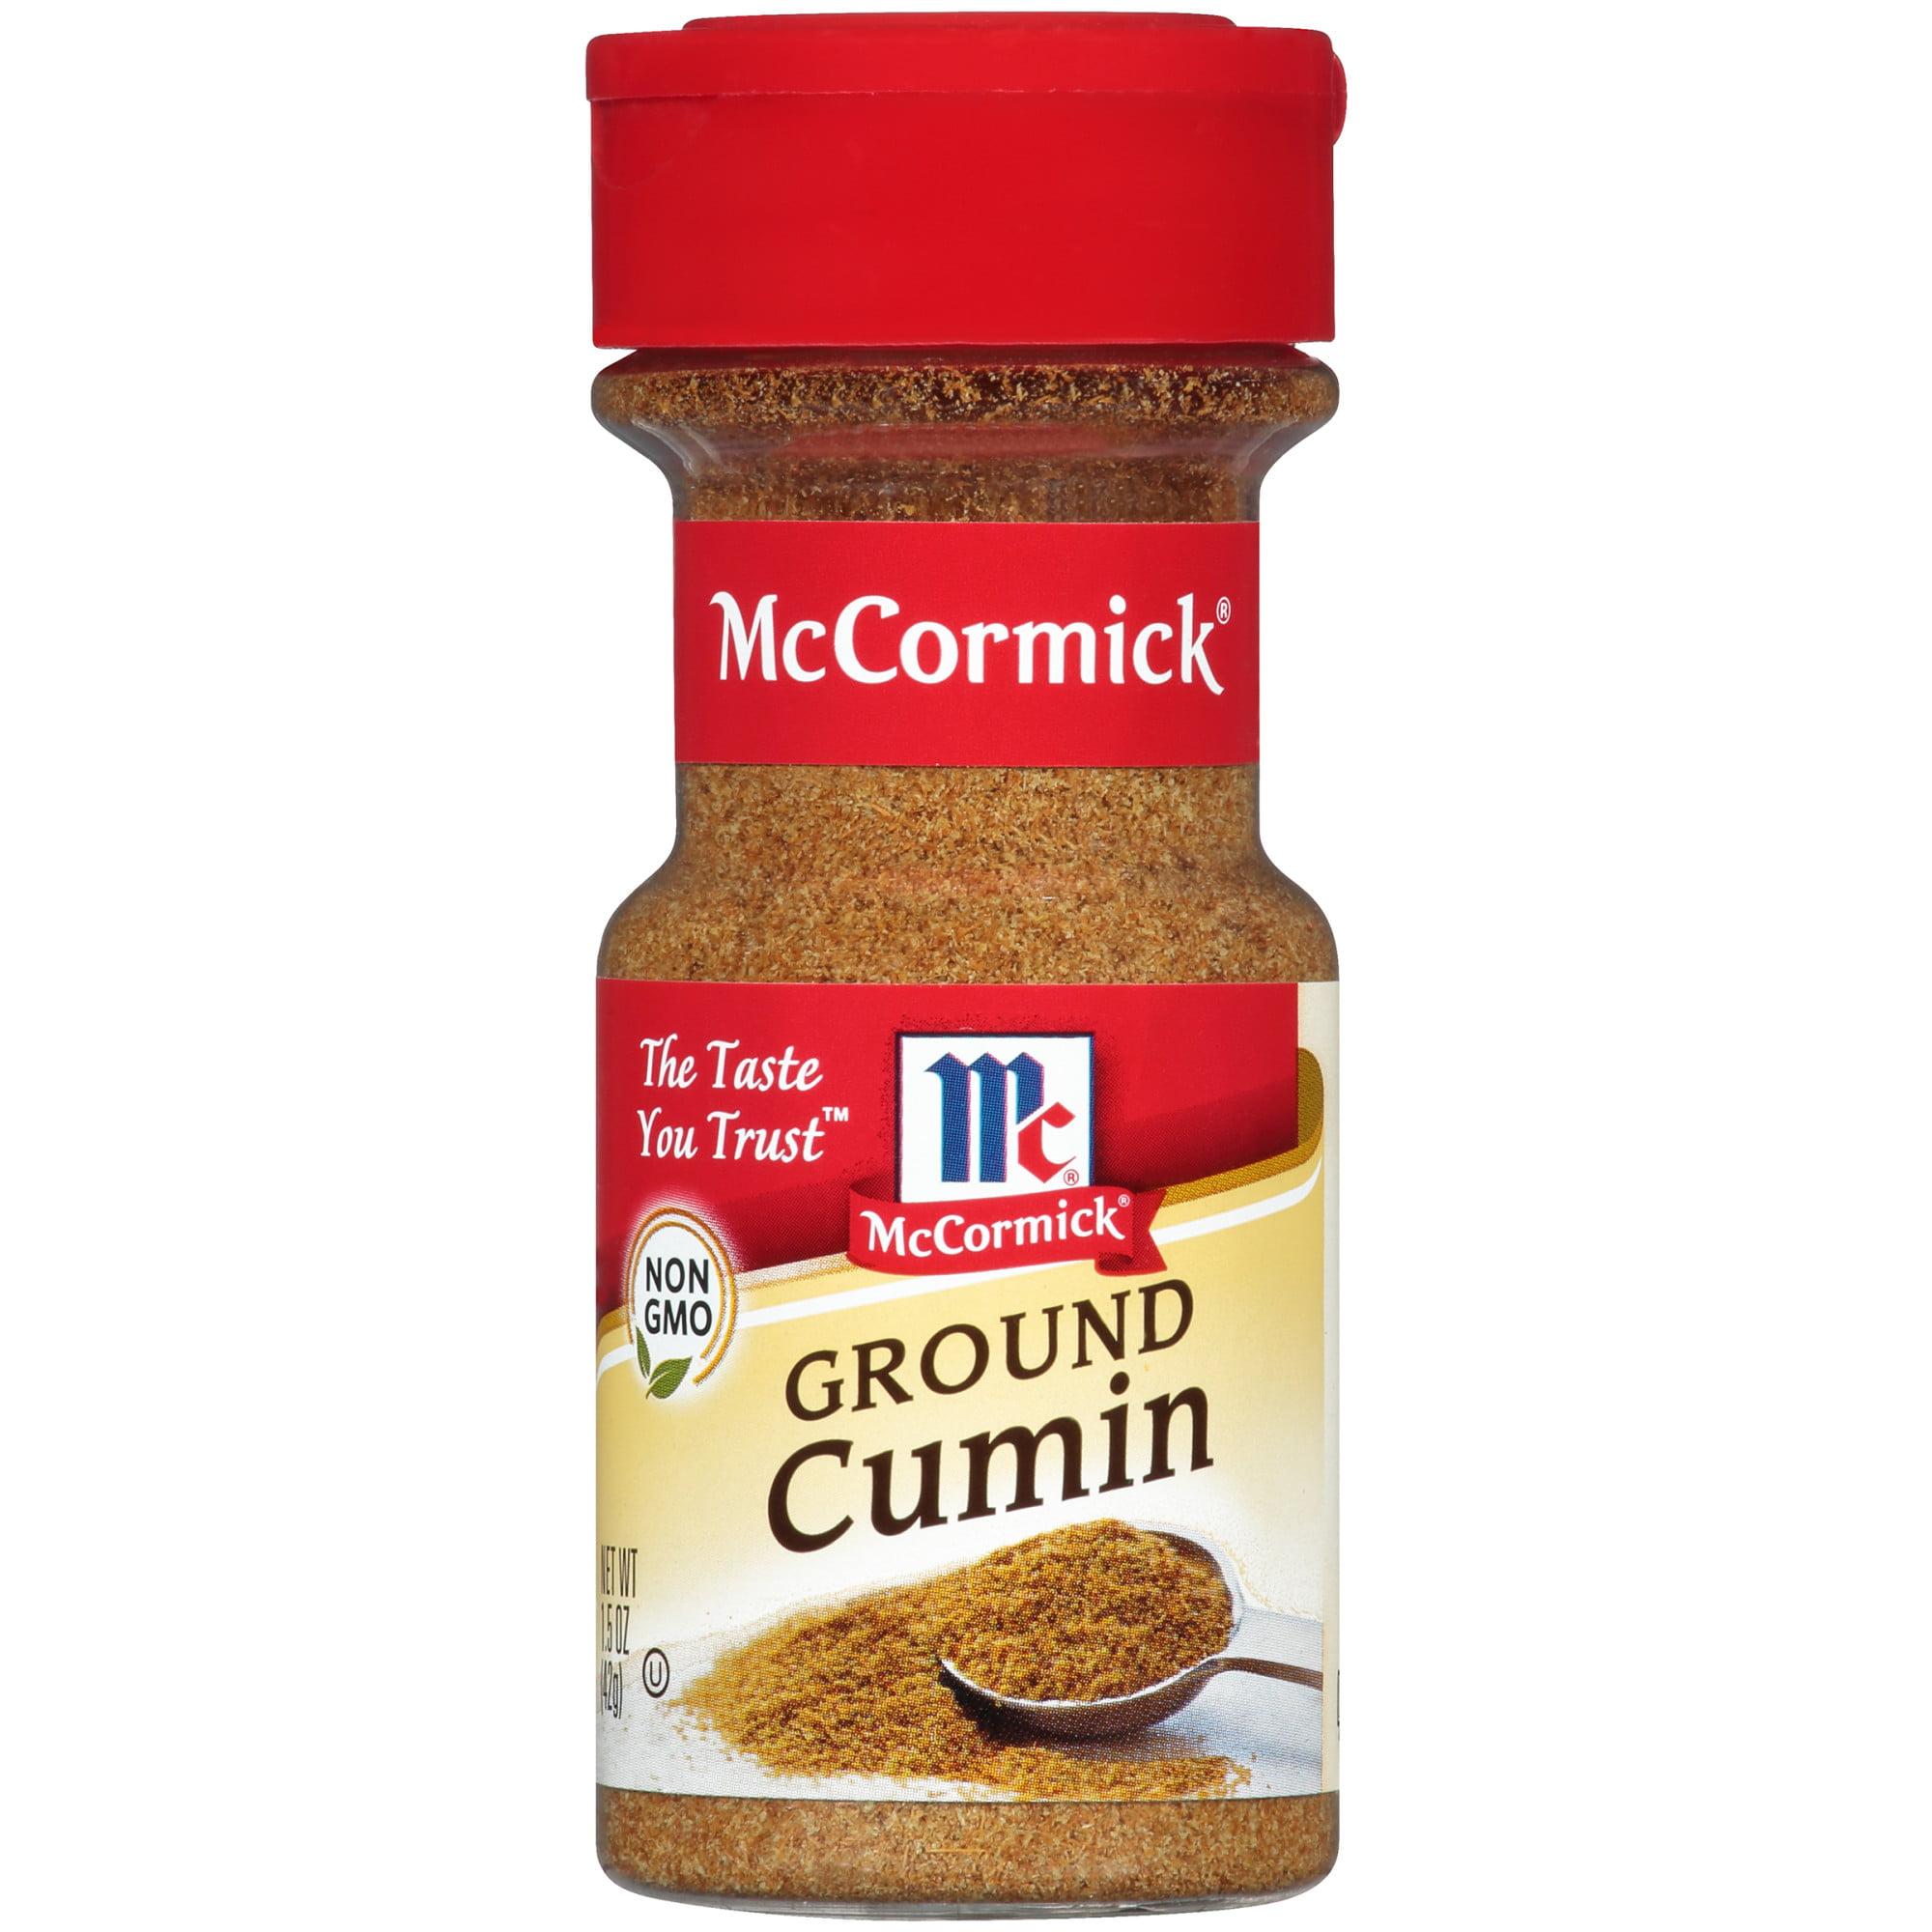 (2 Pack) McCormick Ground Cumin, 1.5 oz